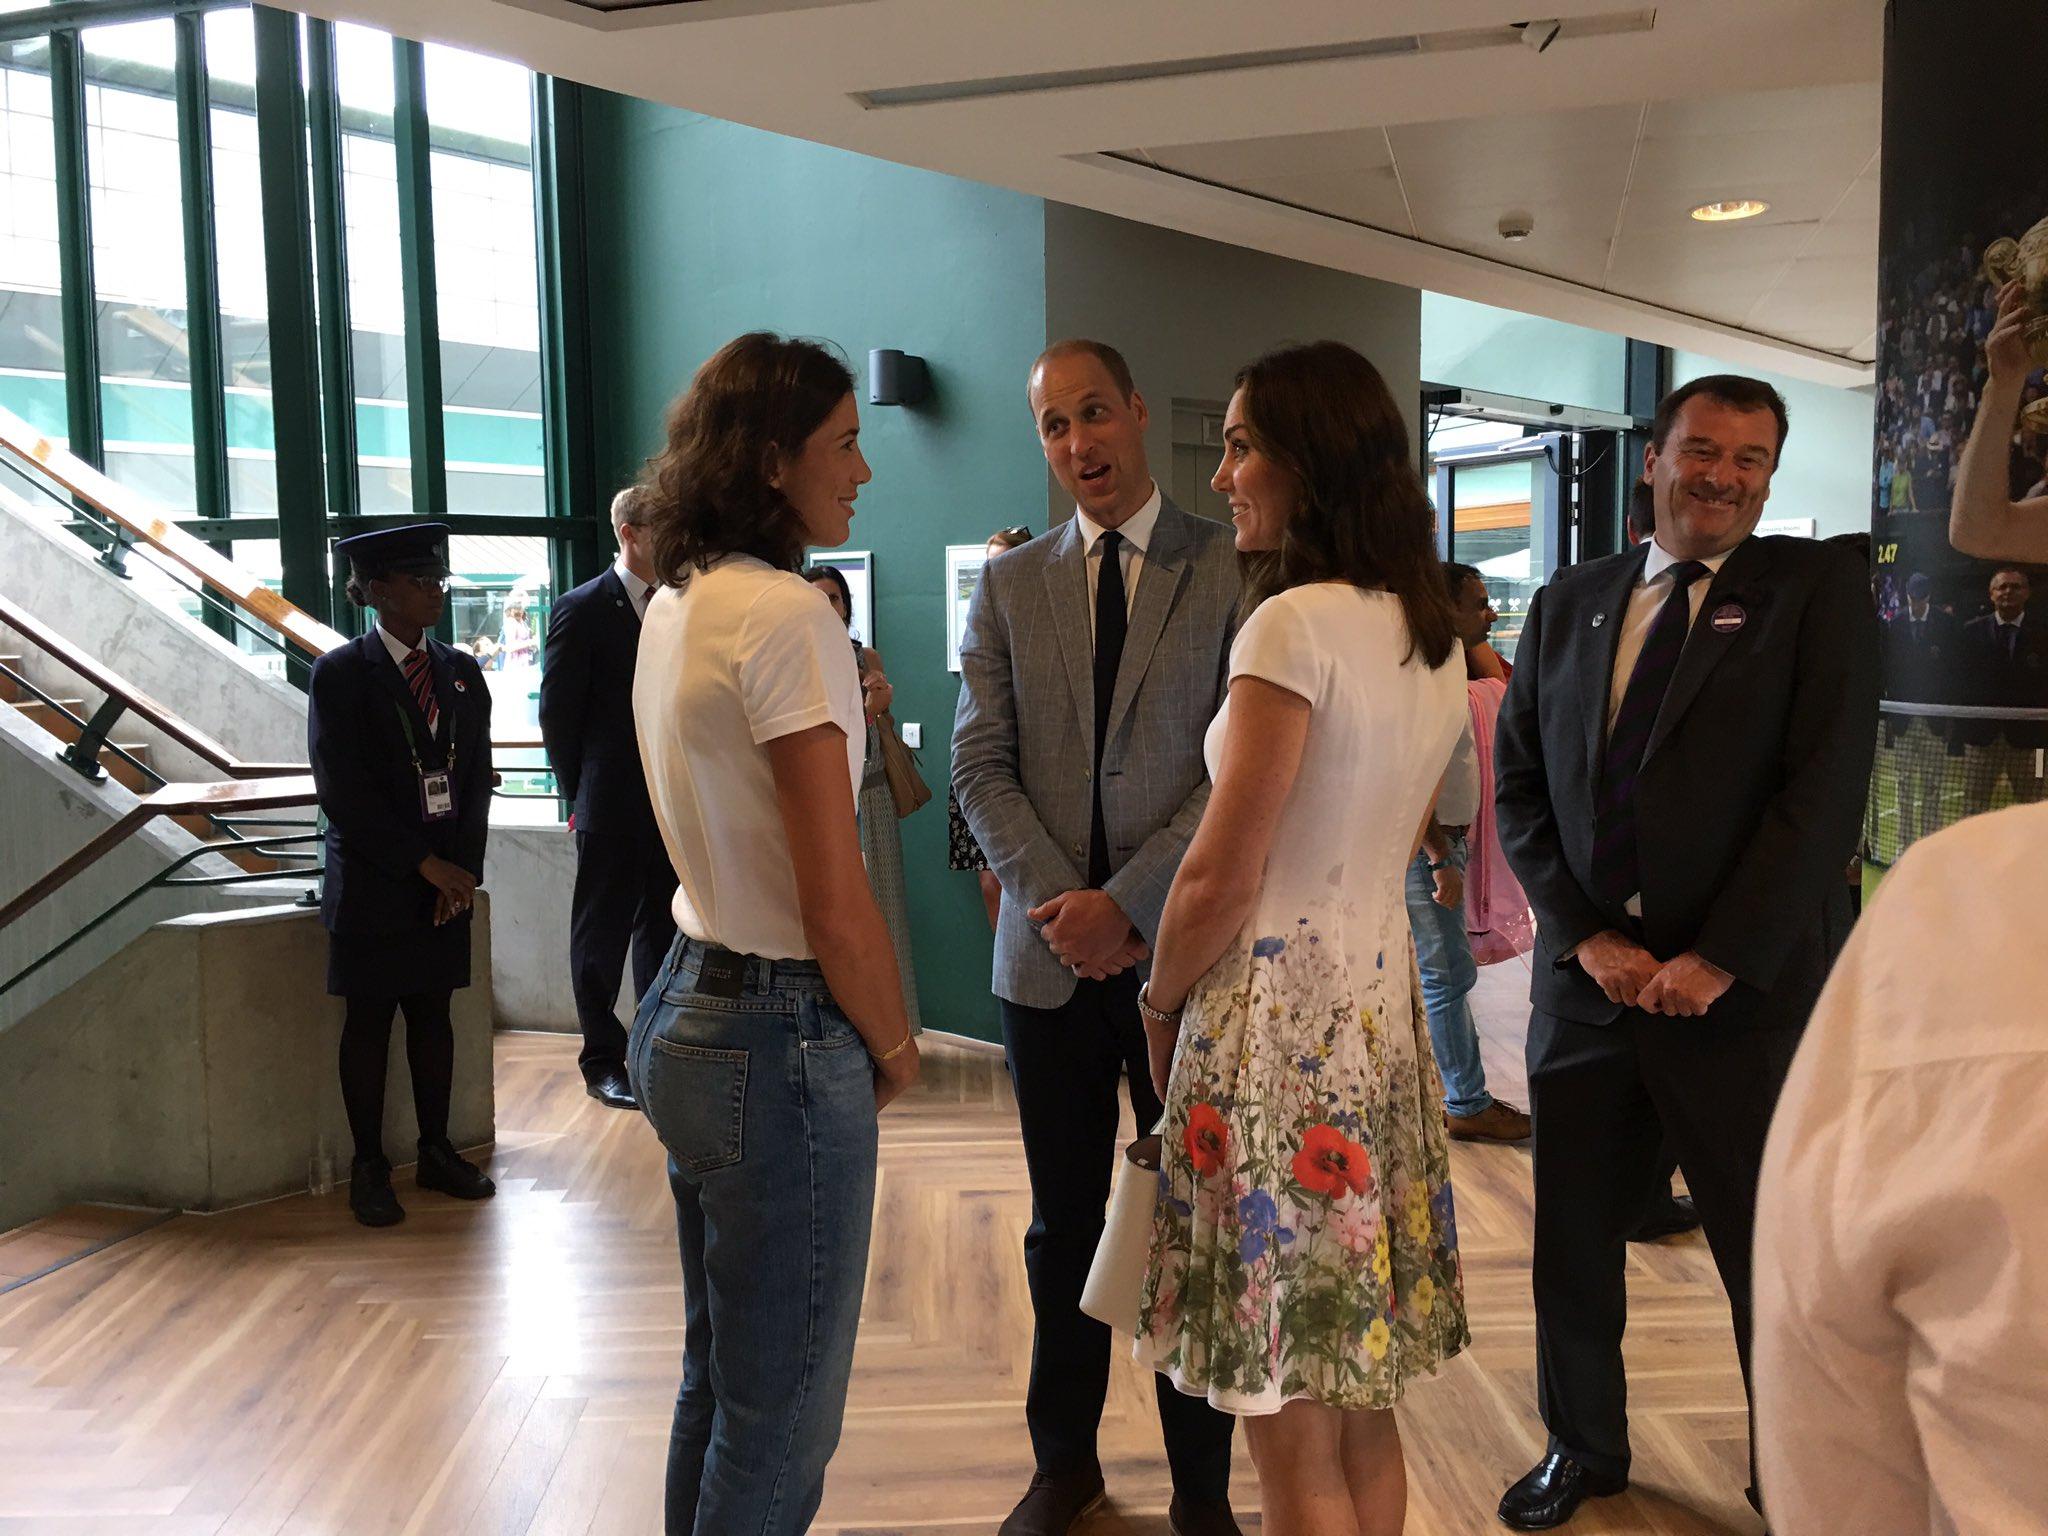 Great meeting the Dukes of Cambridge today the Club. Feliz de conocer a los Diques de Cambridge. https://t.co/NZRkKqr8RM